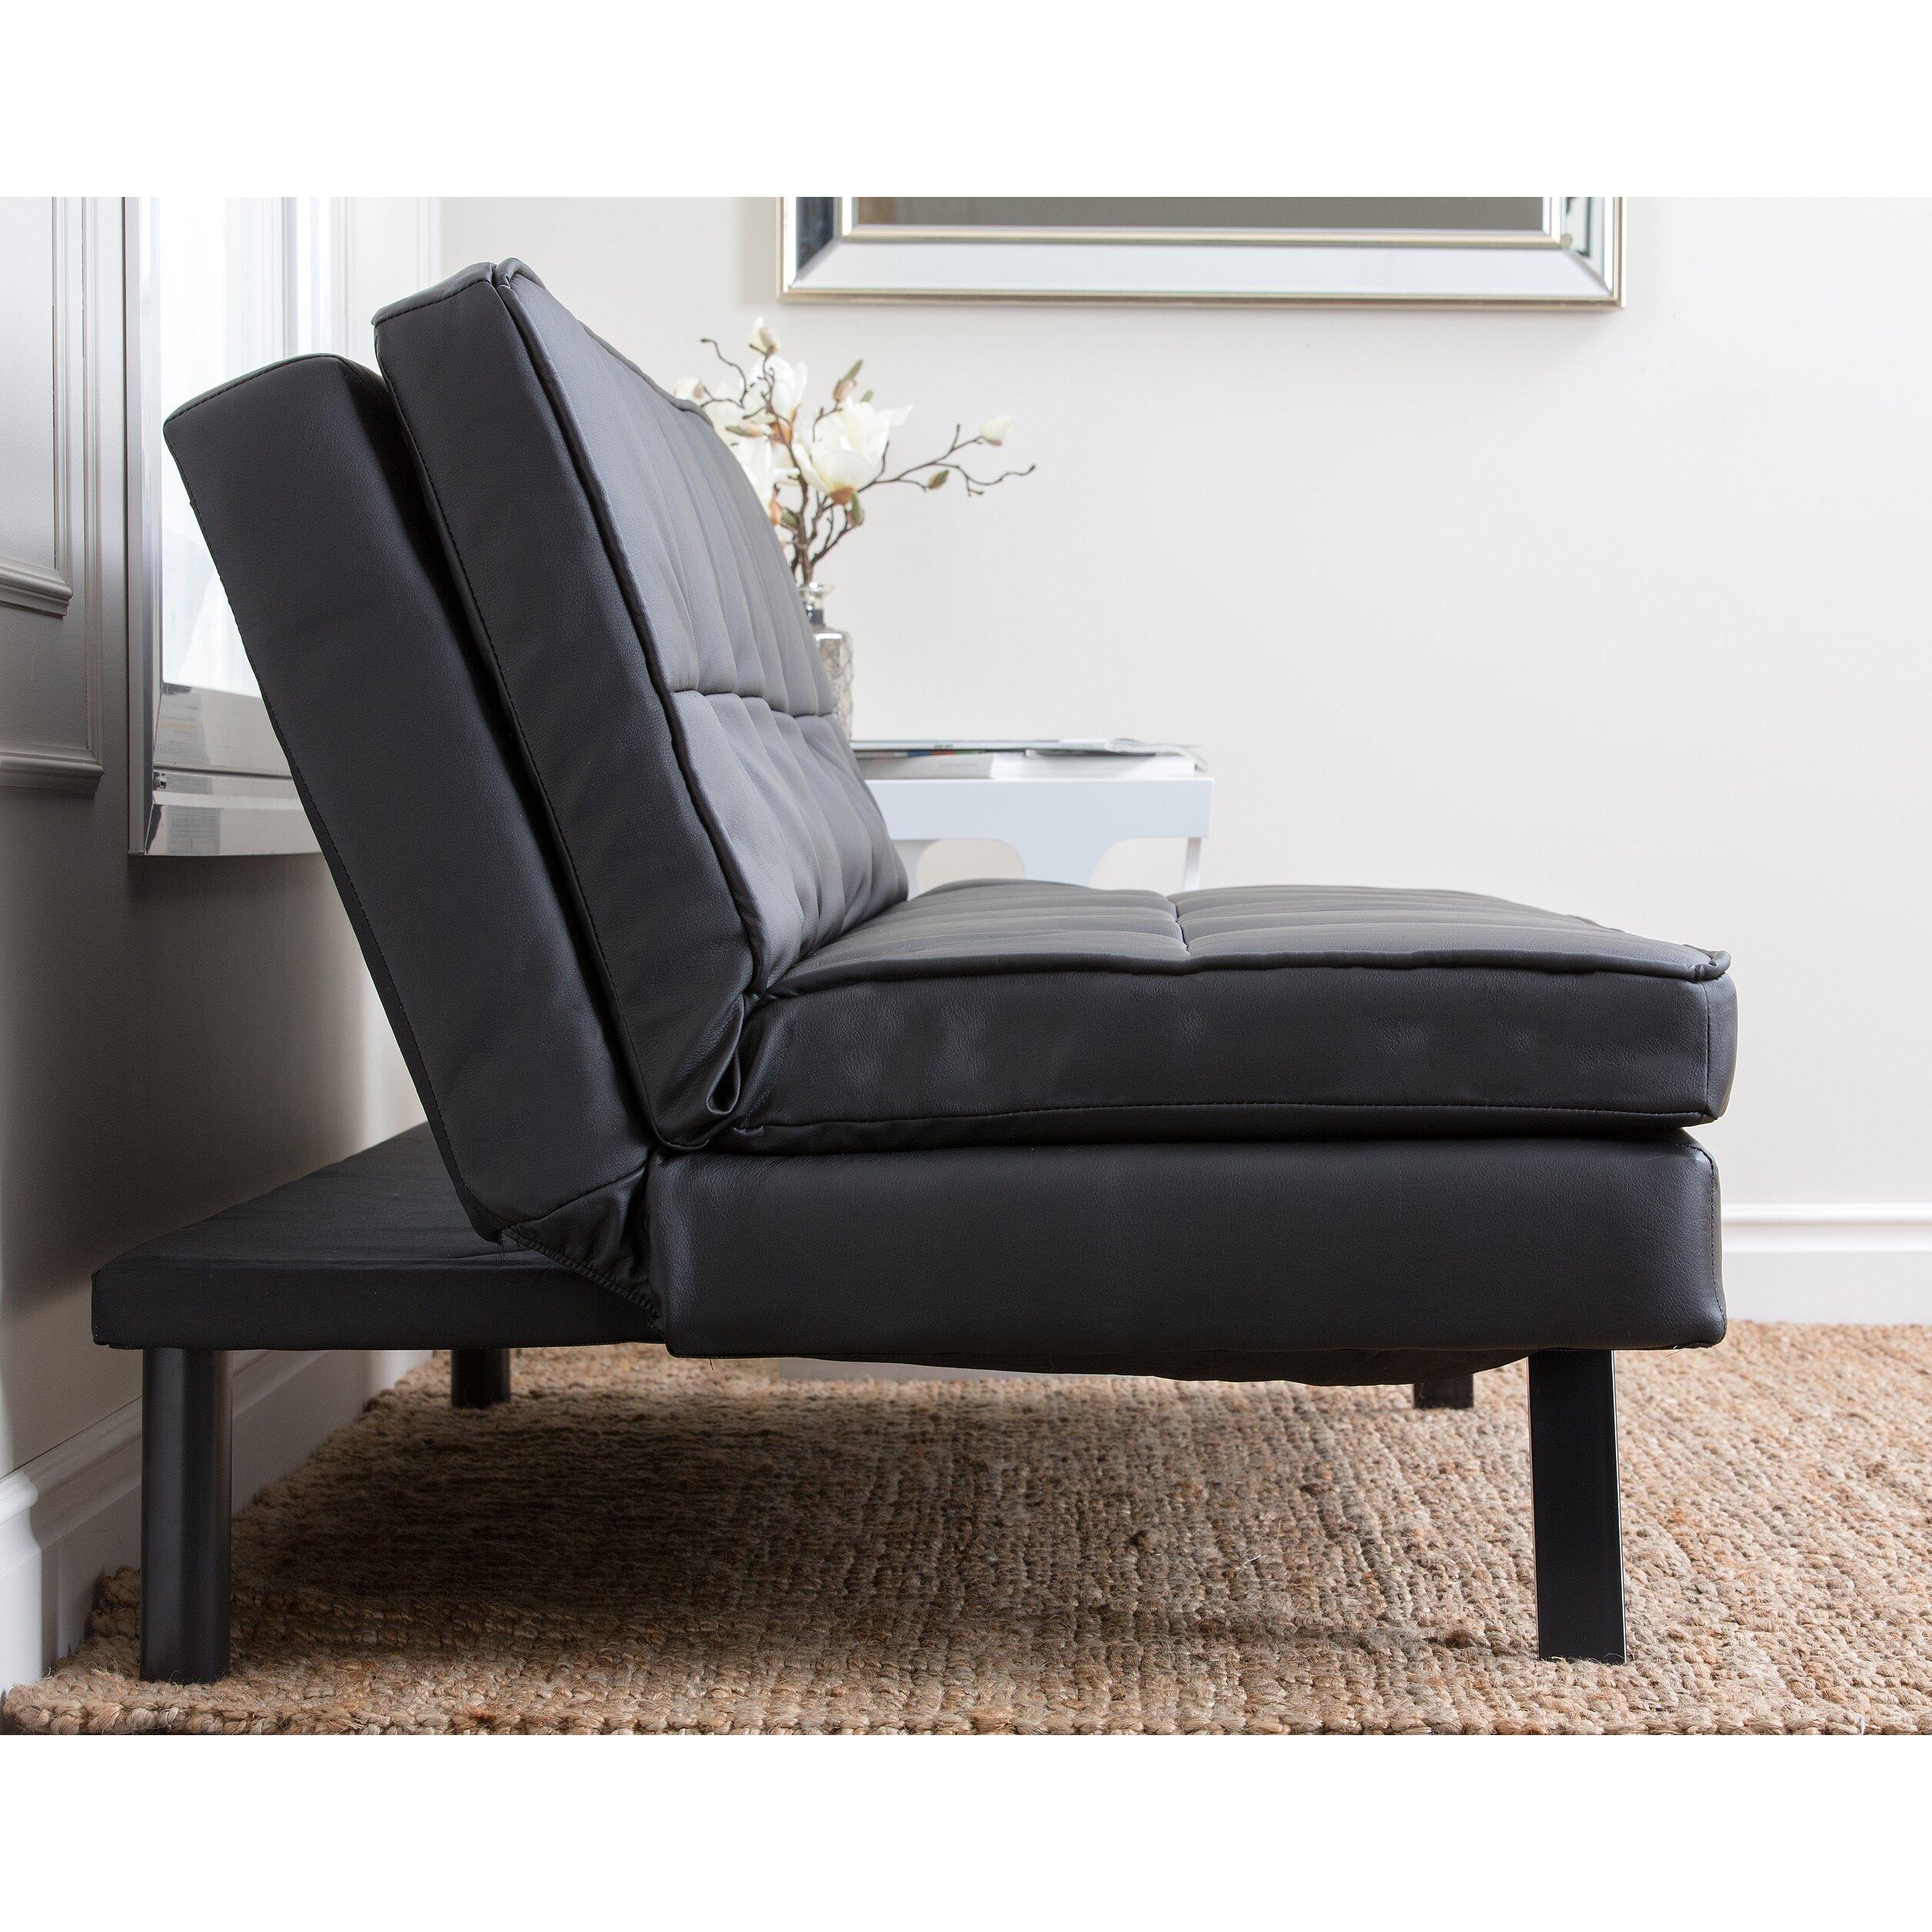 Abbyson Living Furniture Reviews : Abbyson Living Sleeper Sofa & Reviews  Wayfair